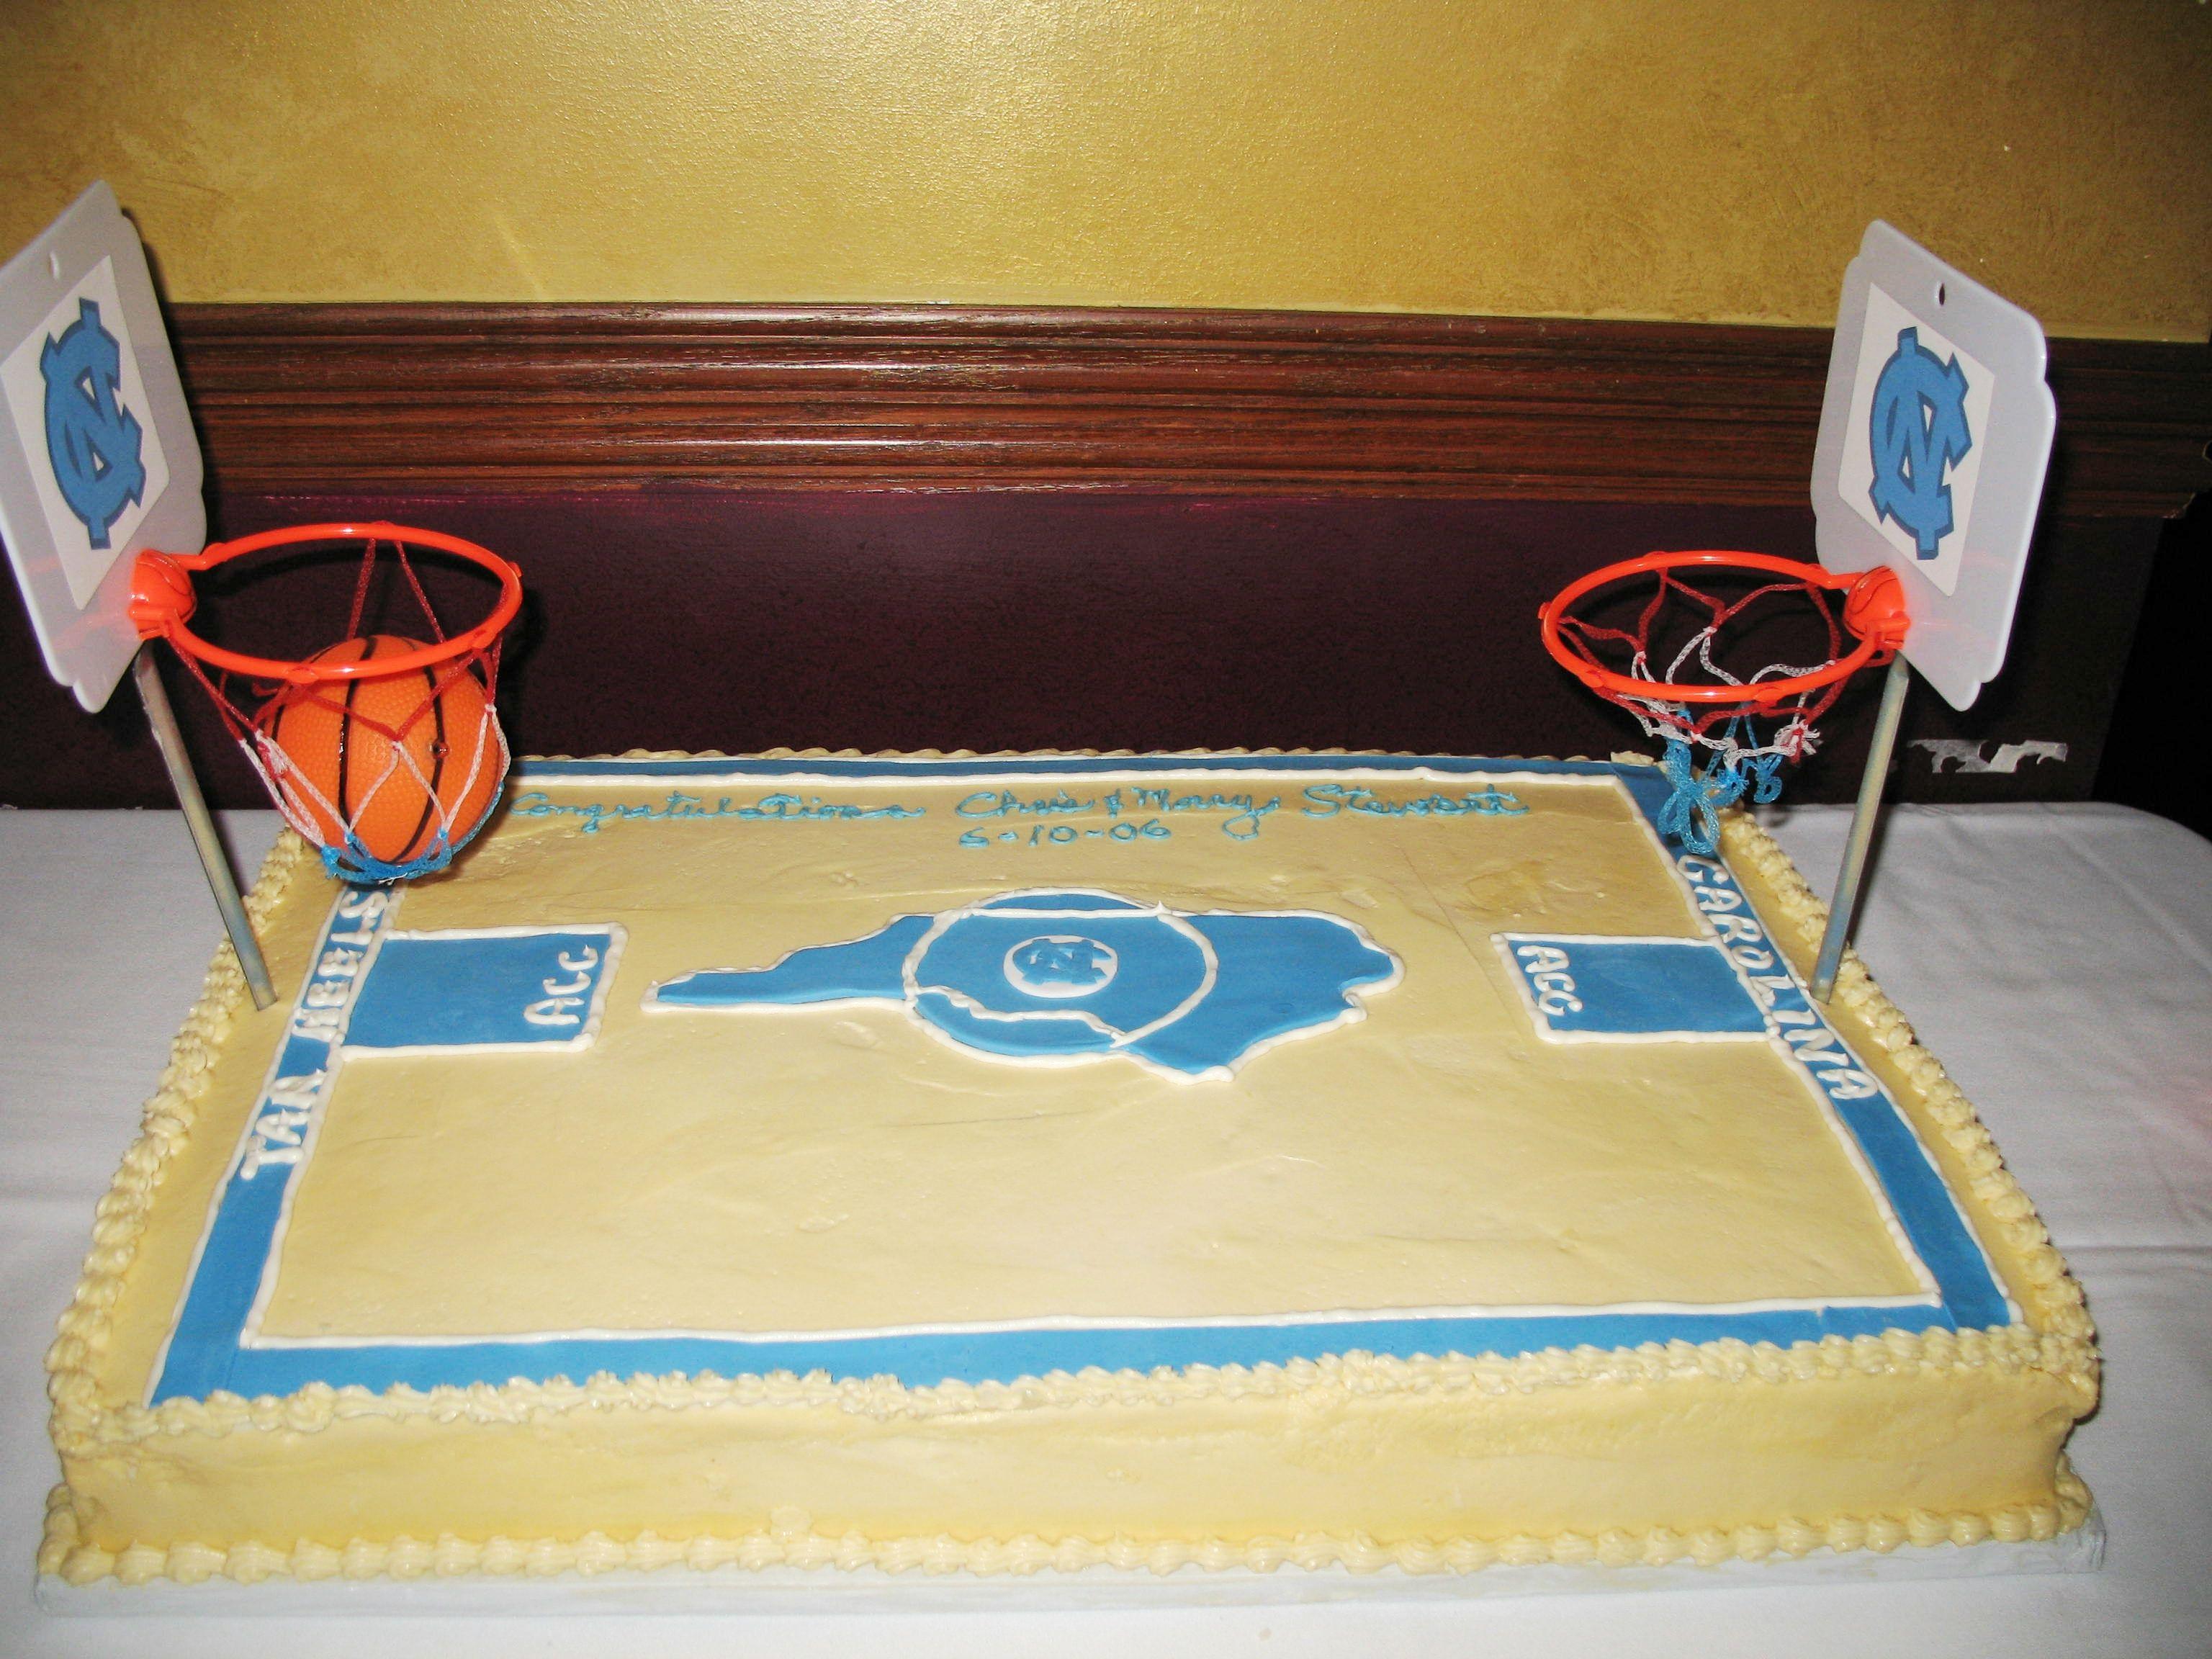 basketball court cake www.cheesecakeetc.biz wedding cakes Charlotte ...